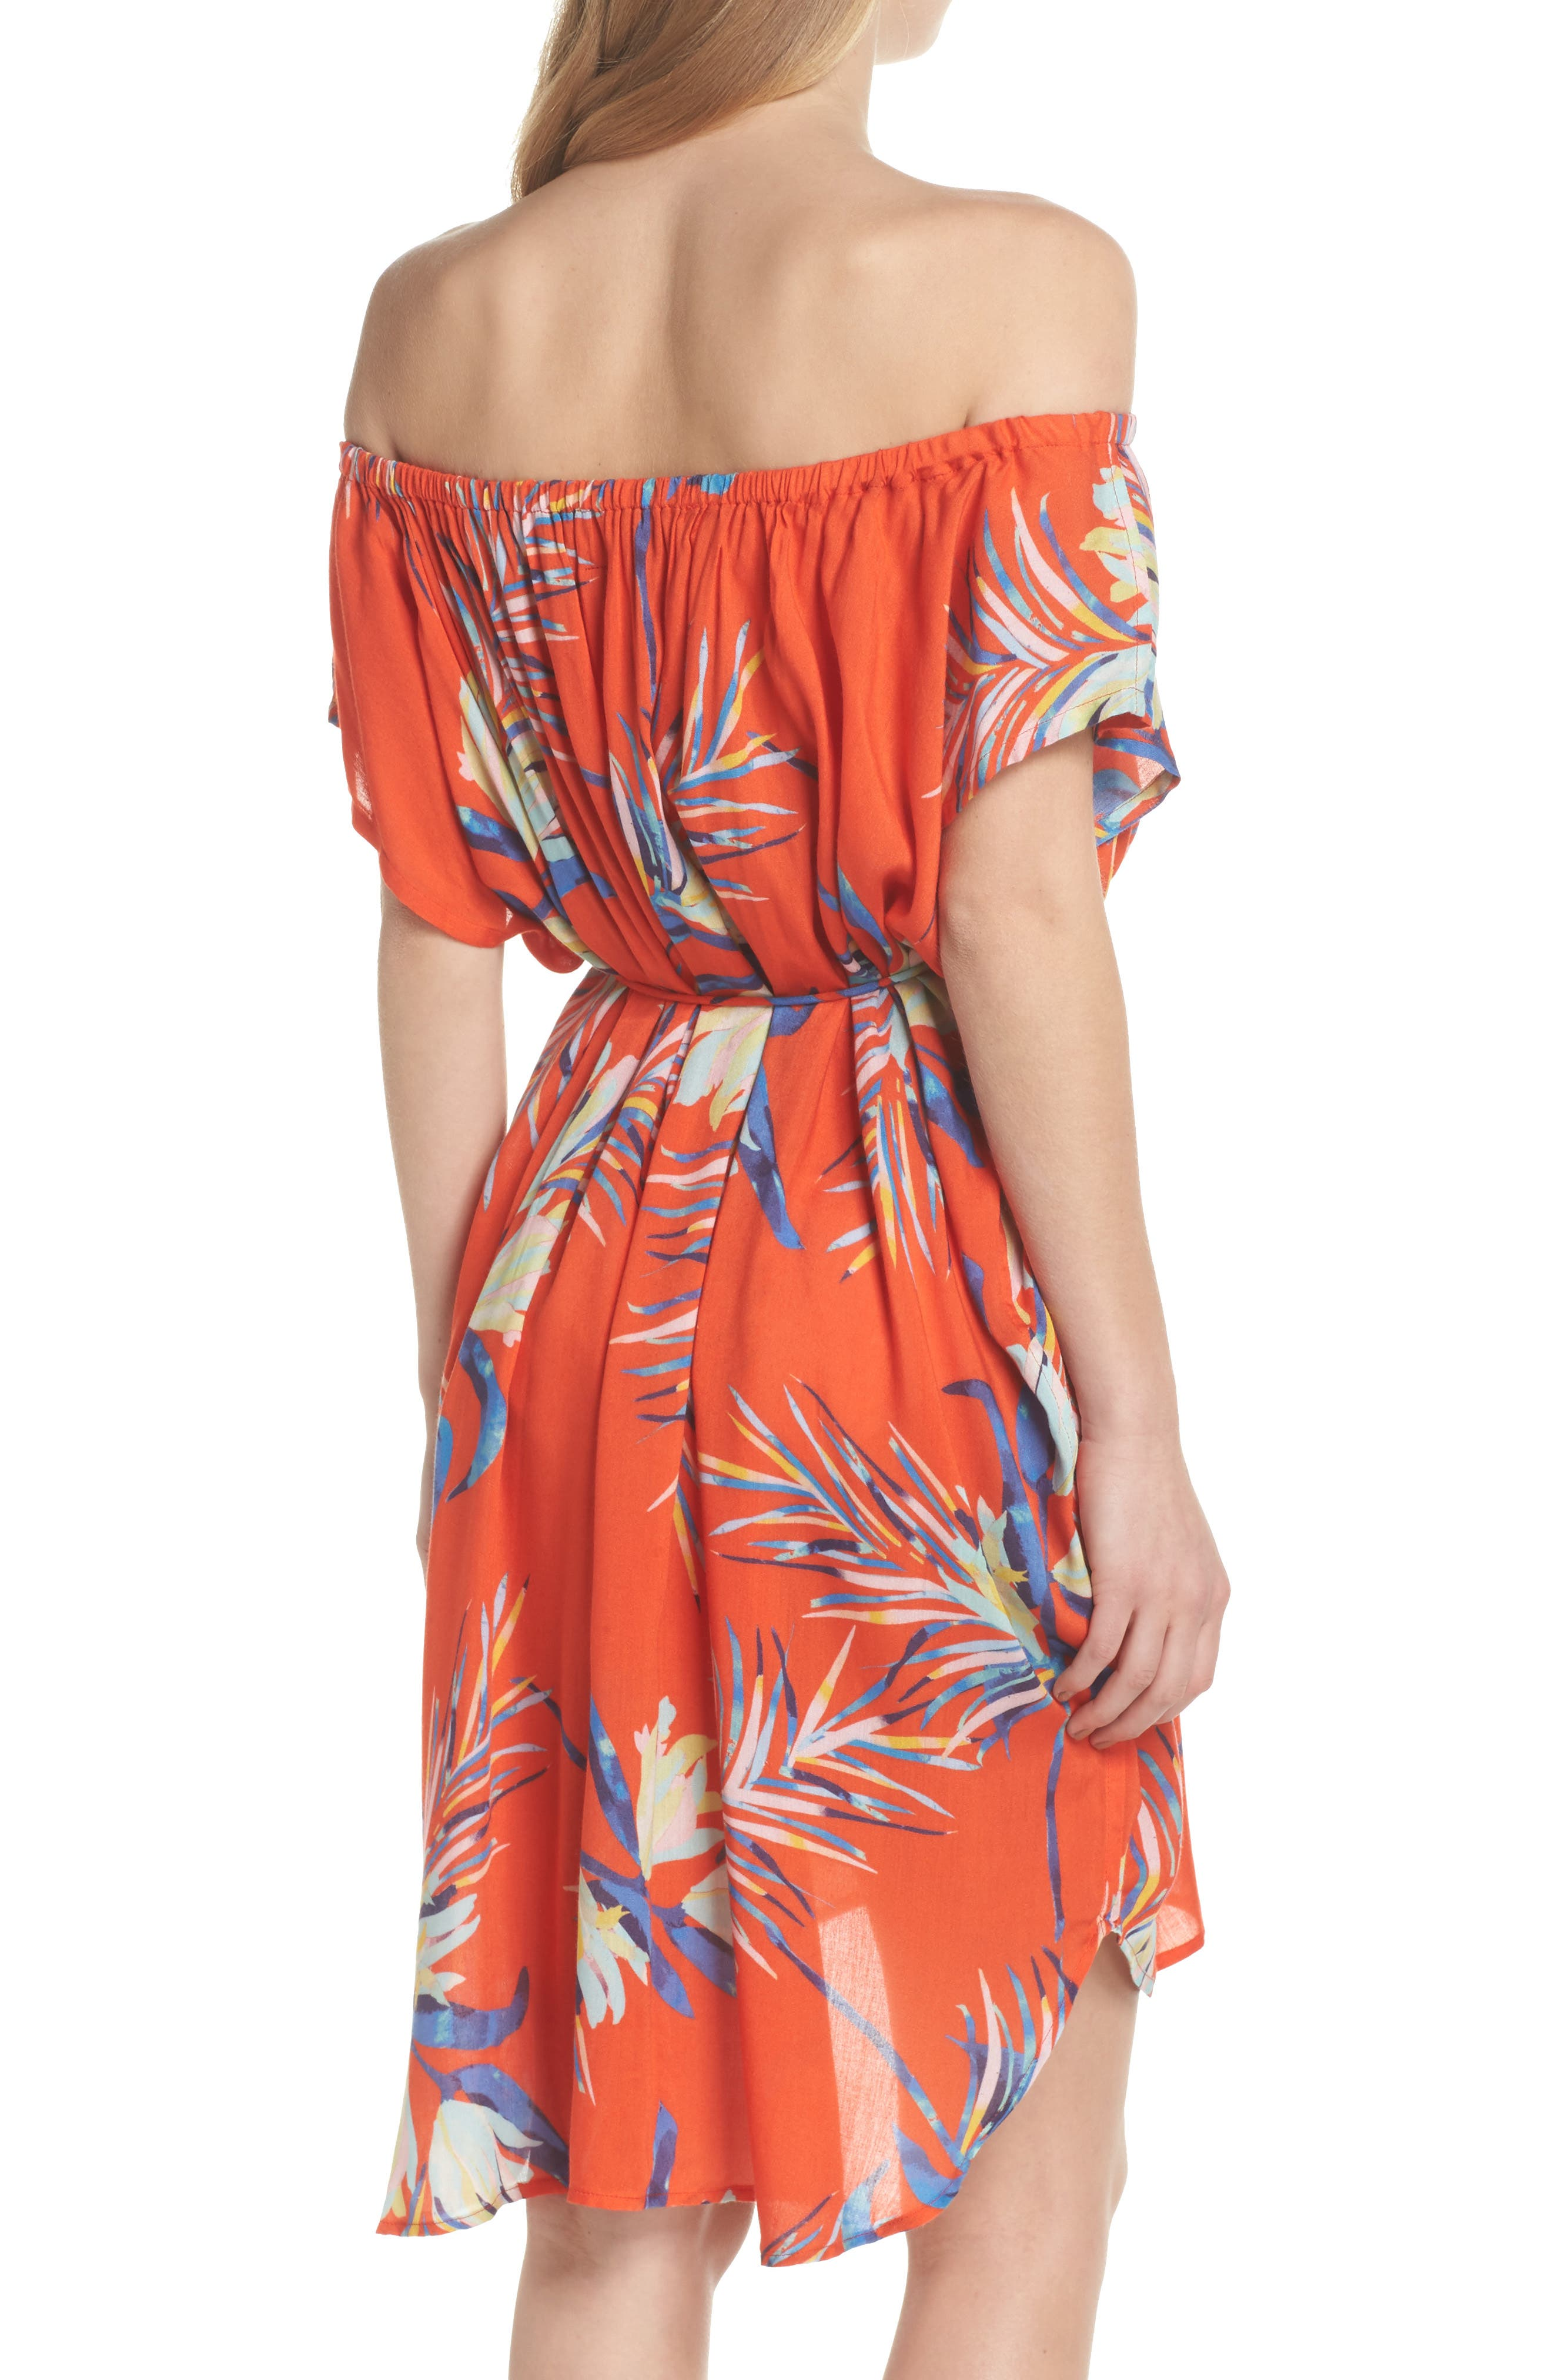 Paradise Palm Off the Shoulder Cover-Up Dress,                             Alternate thumbnail 2, color,                             Tangerine